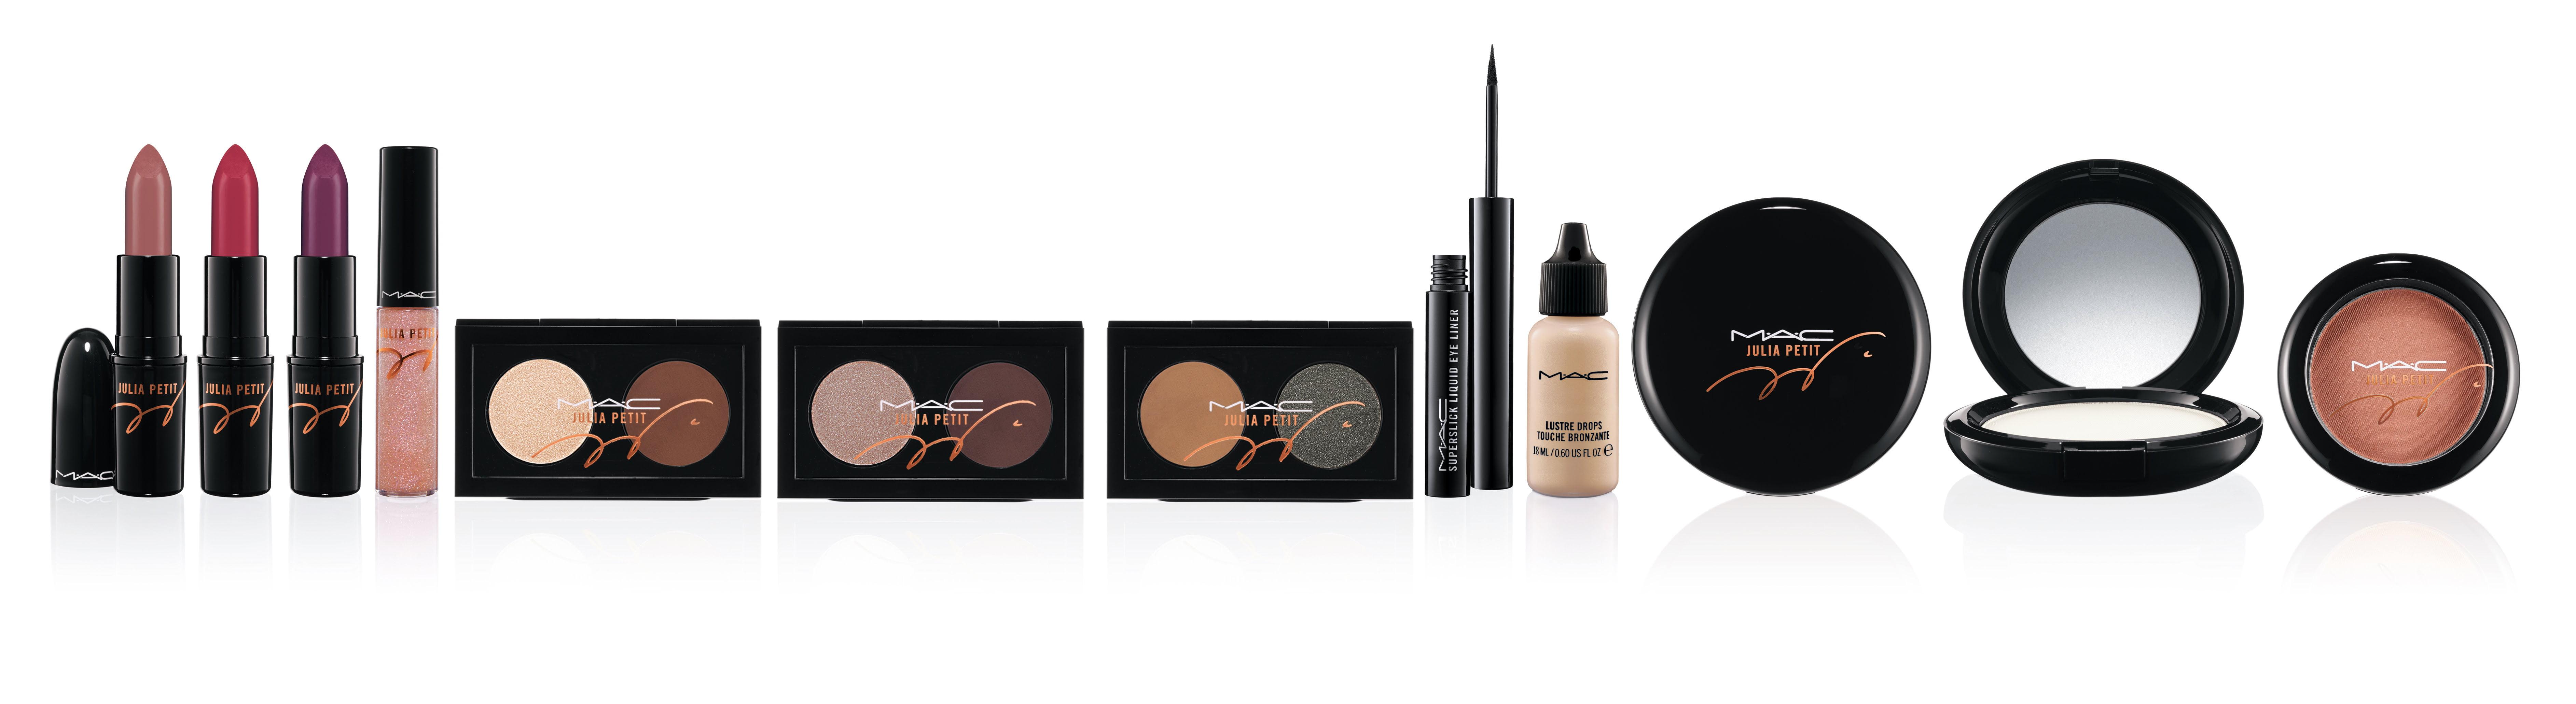 Mac cosmetics sale